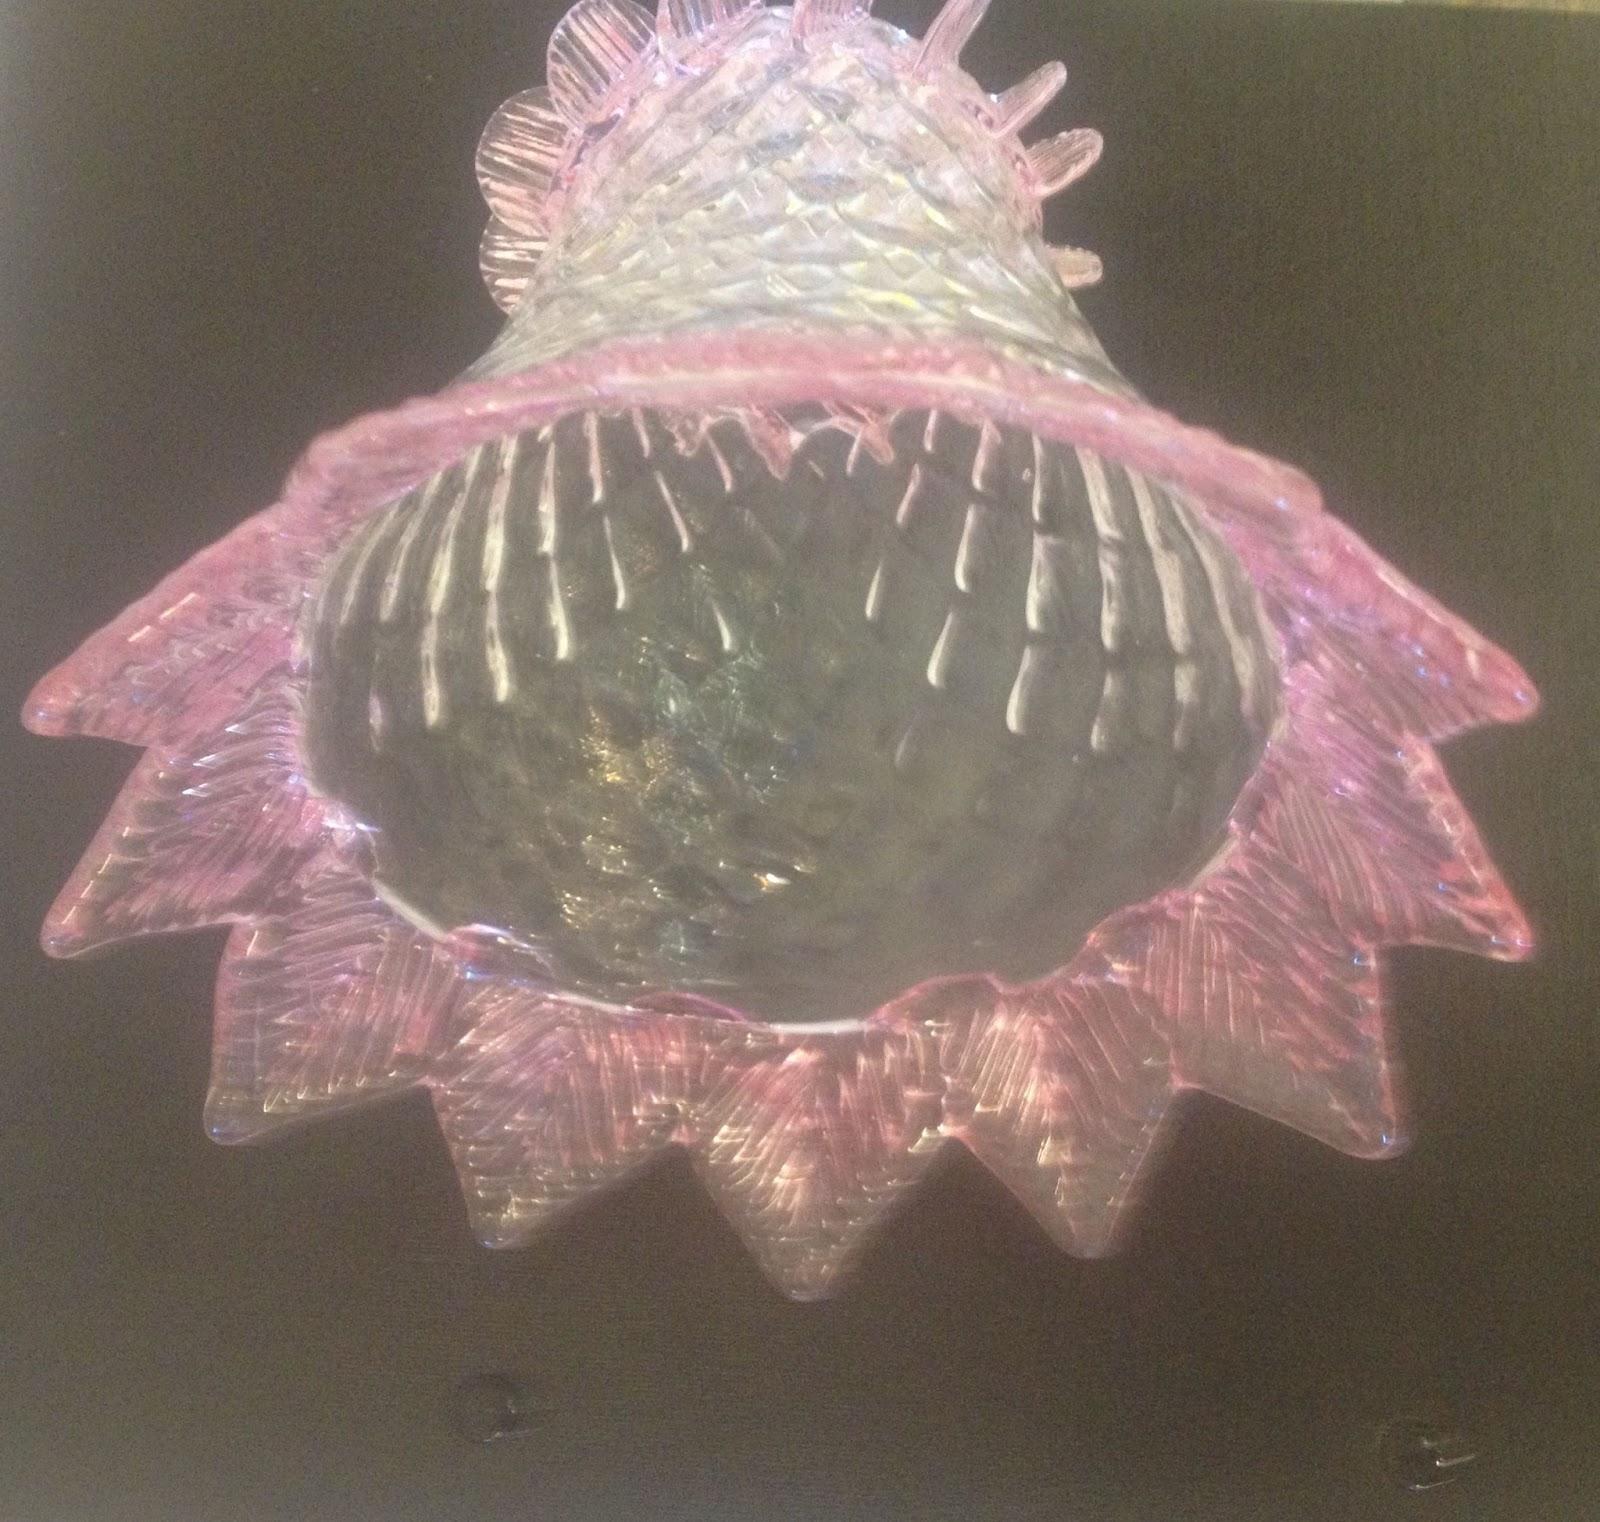 ricambi lampadari murano : Ricambi per lampadari in vetro di Murano: Tazze,pezzi di ricambio per ...